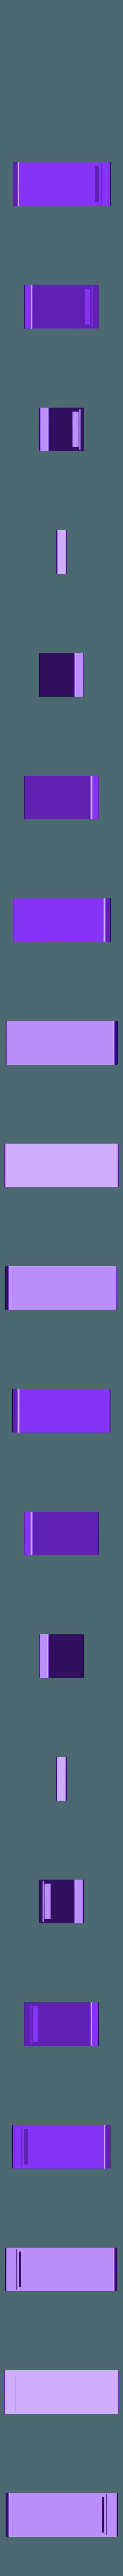 BoiteAClef.stl Download free STL file Magnetic Key Box • 3D printer design, fred6b12